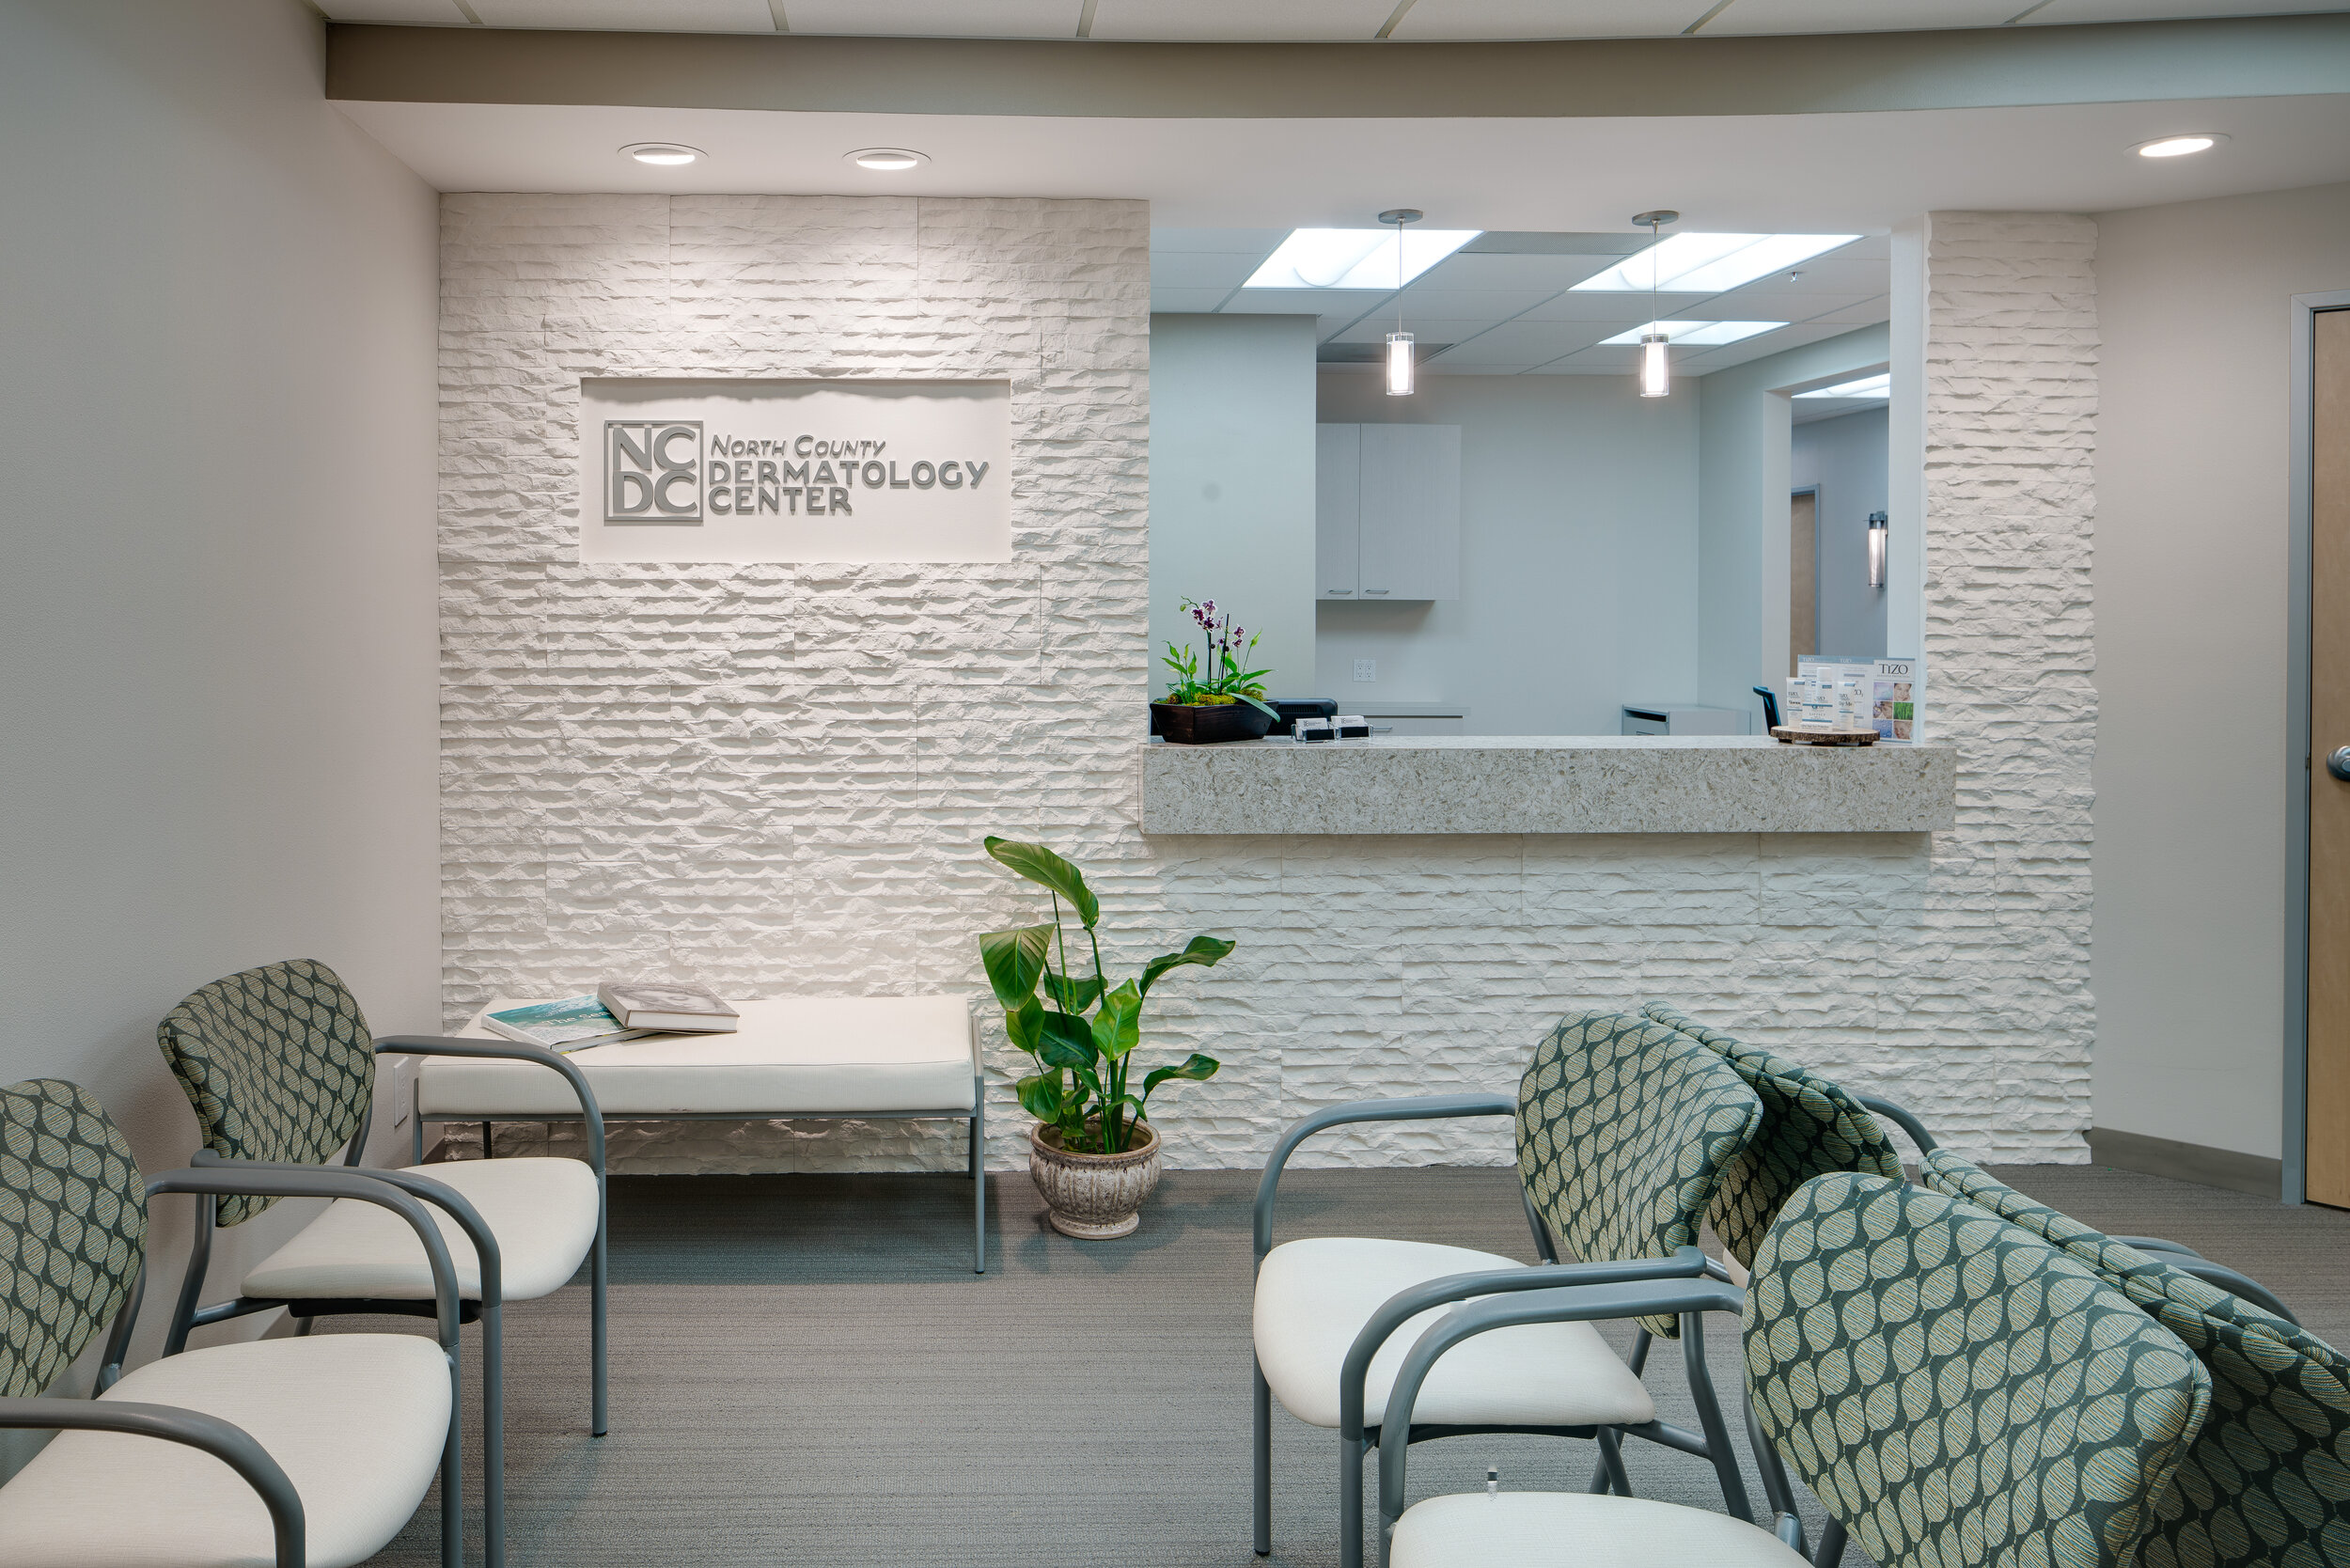 North County Dermatology